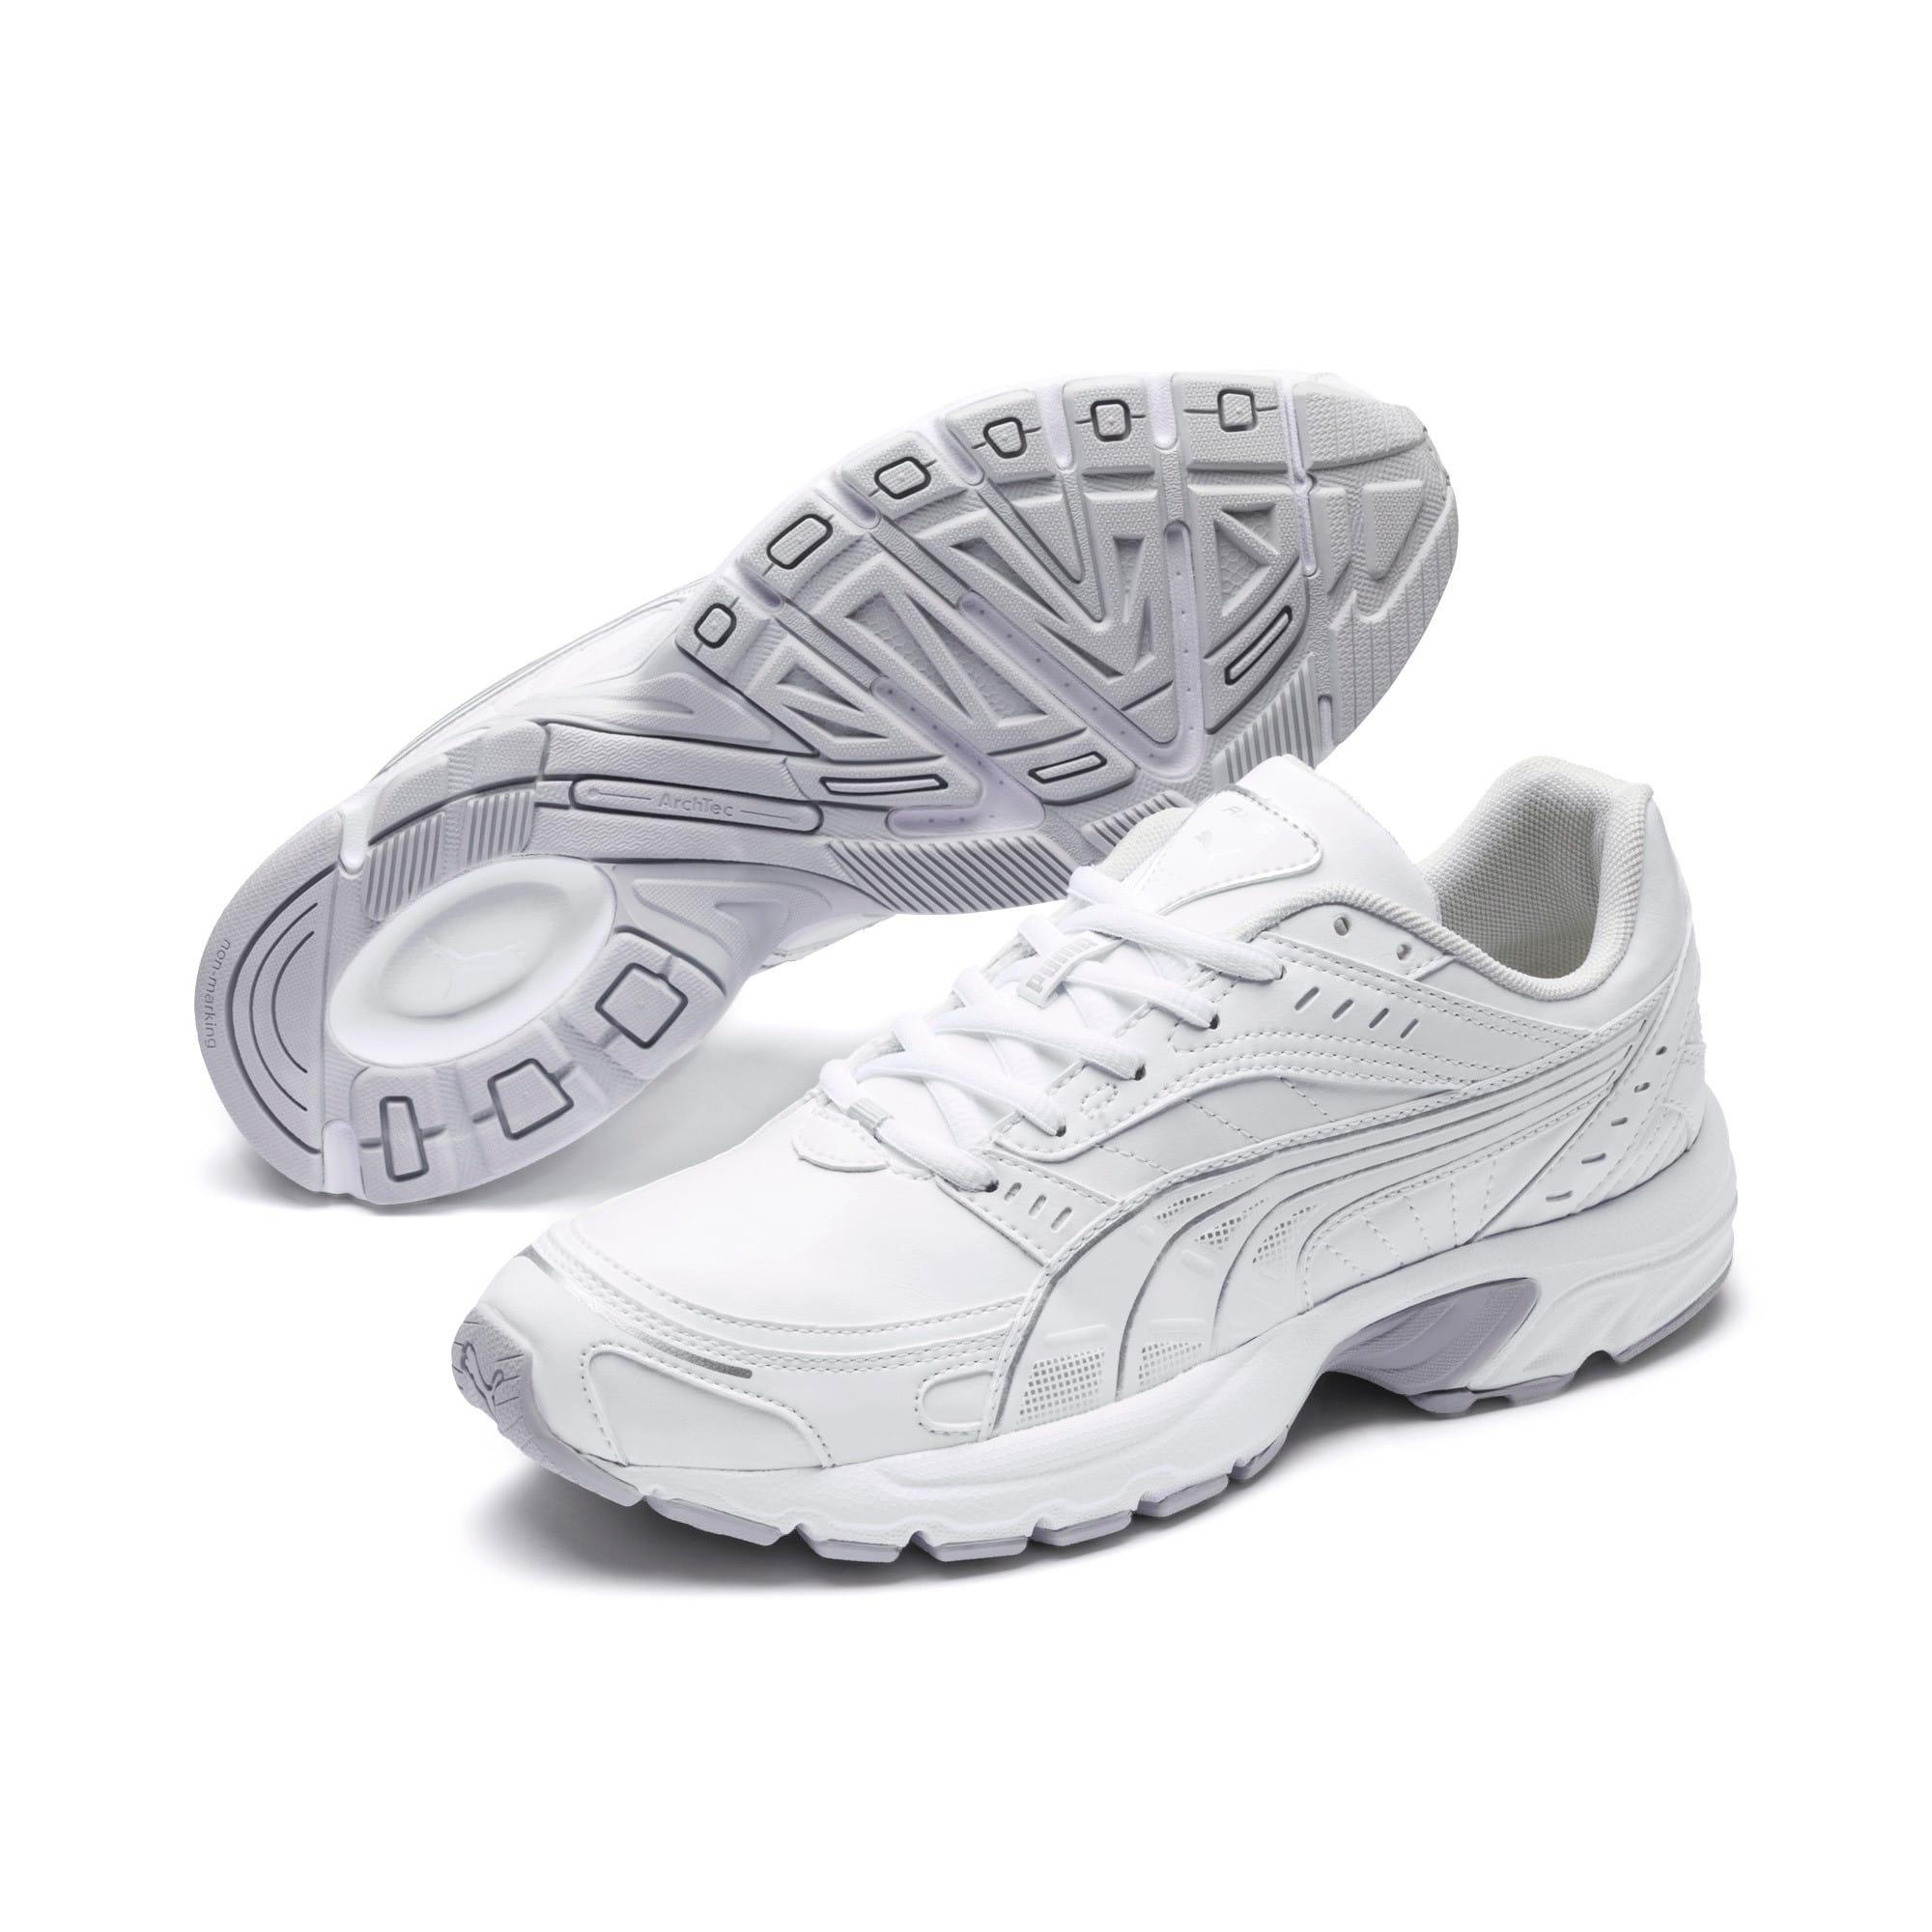 Thumbnail 2 of Axis SL Sneakers, Puma White-Glacier Gray, medium